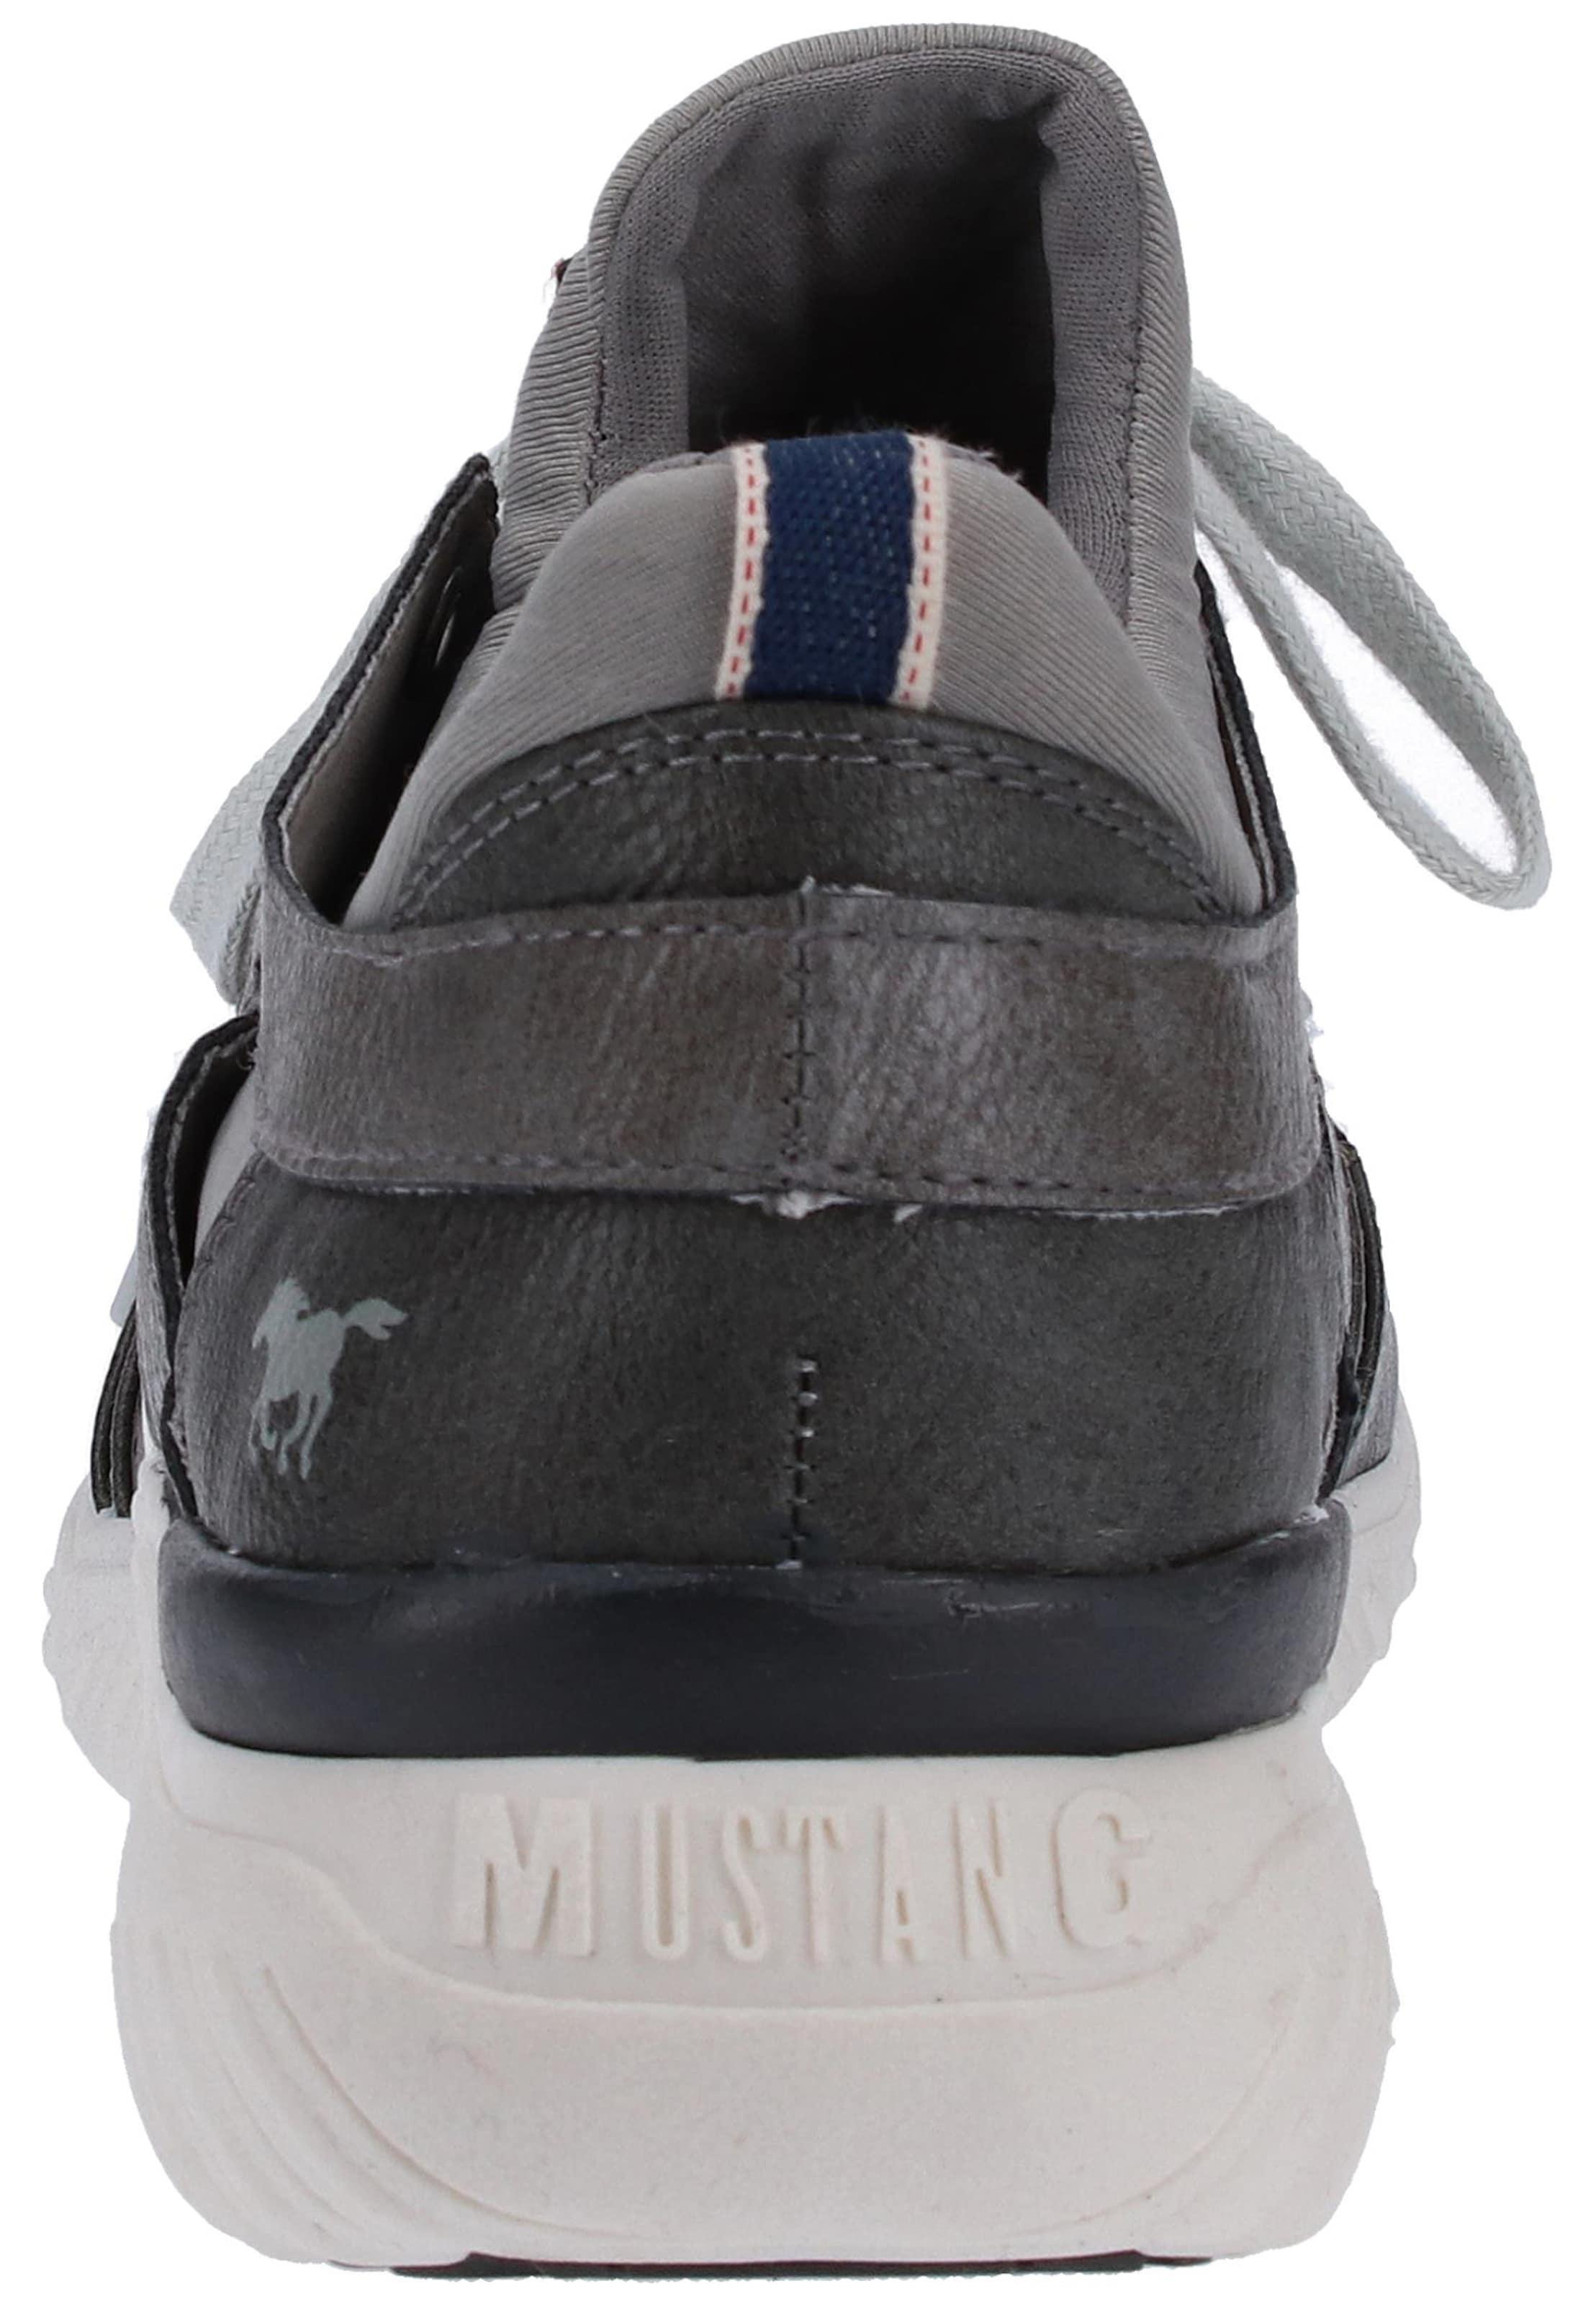 En GrisFoncé Mustang Baskets Basses Nw8XkOn0P